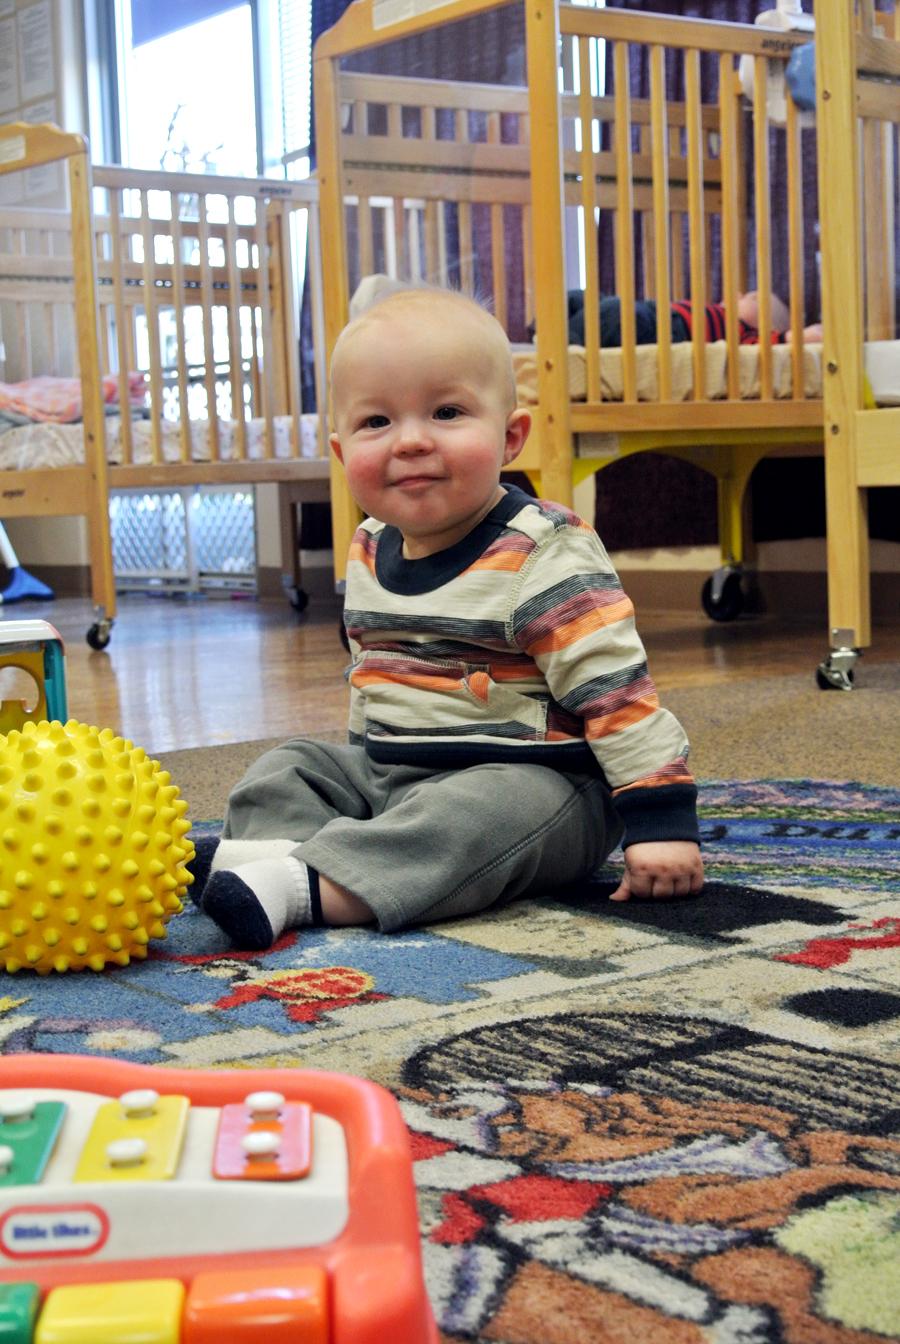 InfantRoomWebPhoto2.jpg